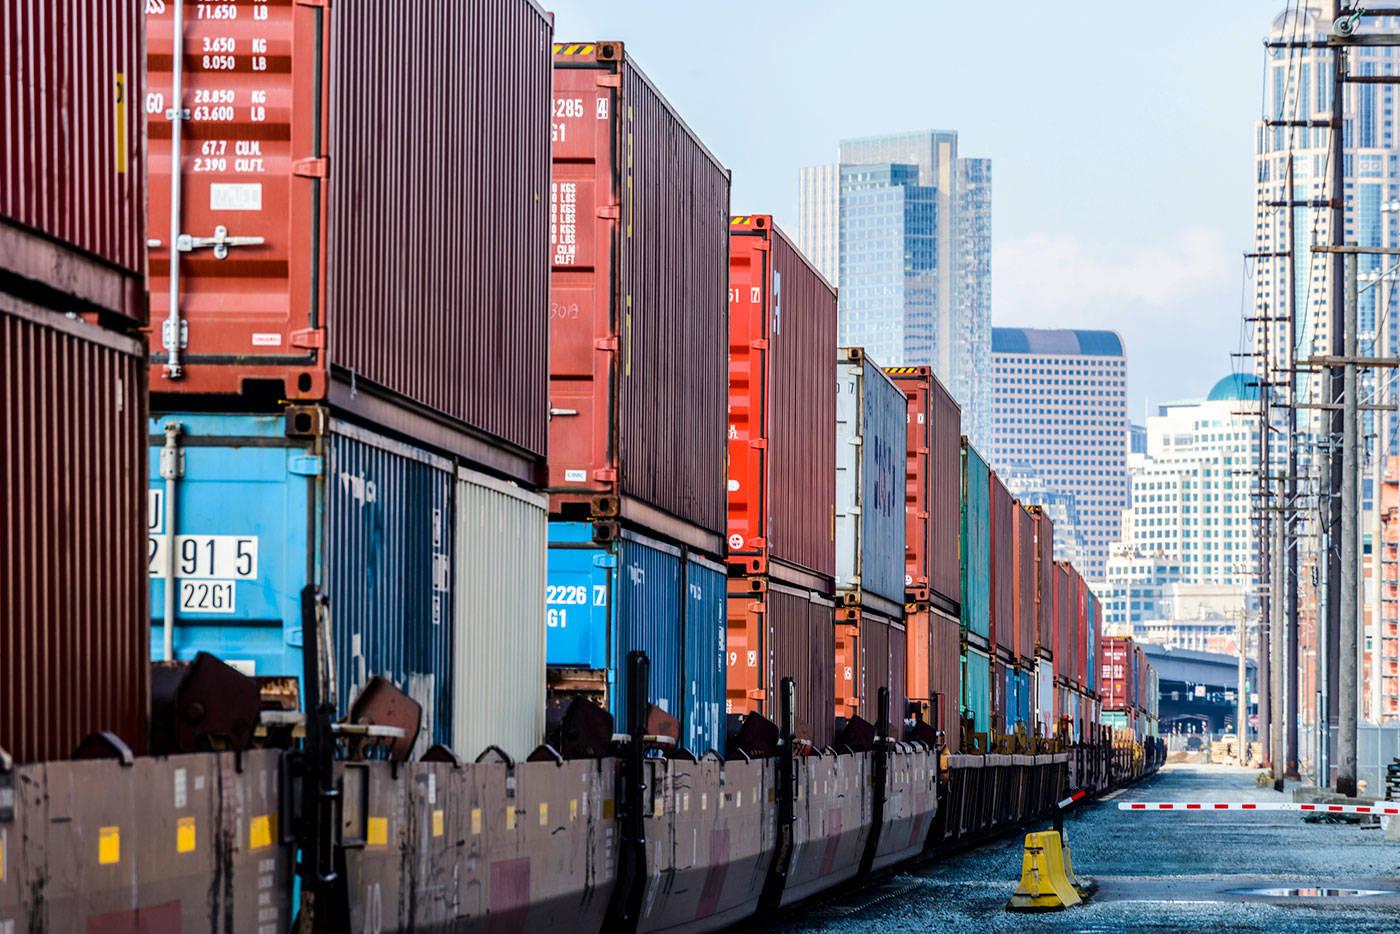 Inconvenient Truths About the US Trade Deficit by Martin Feldstein